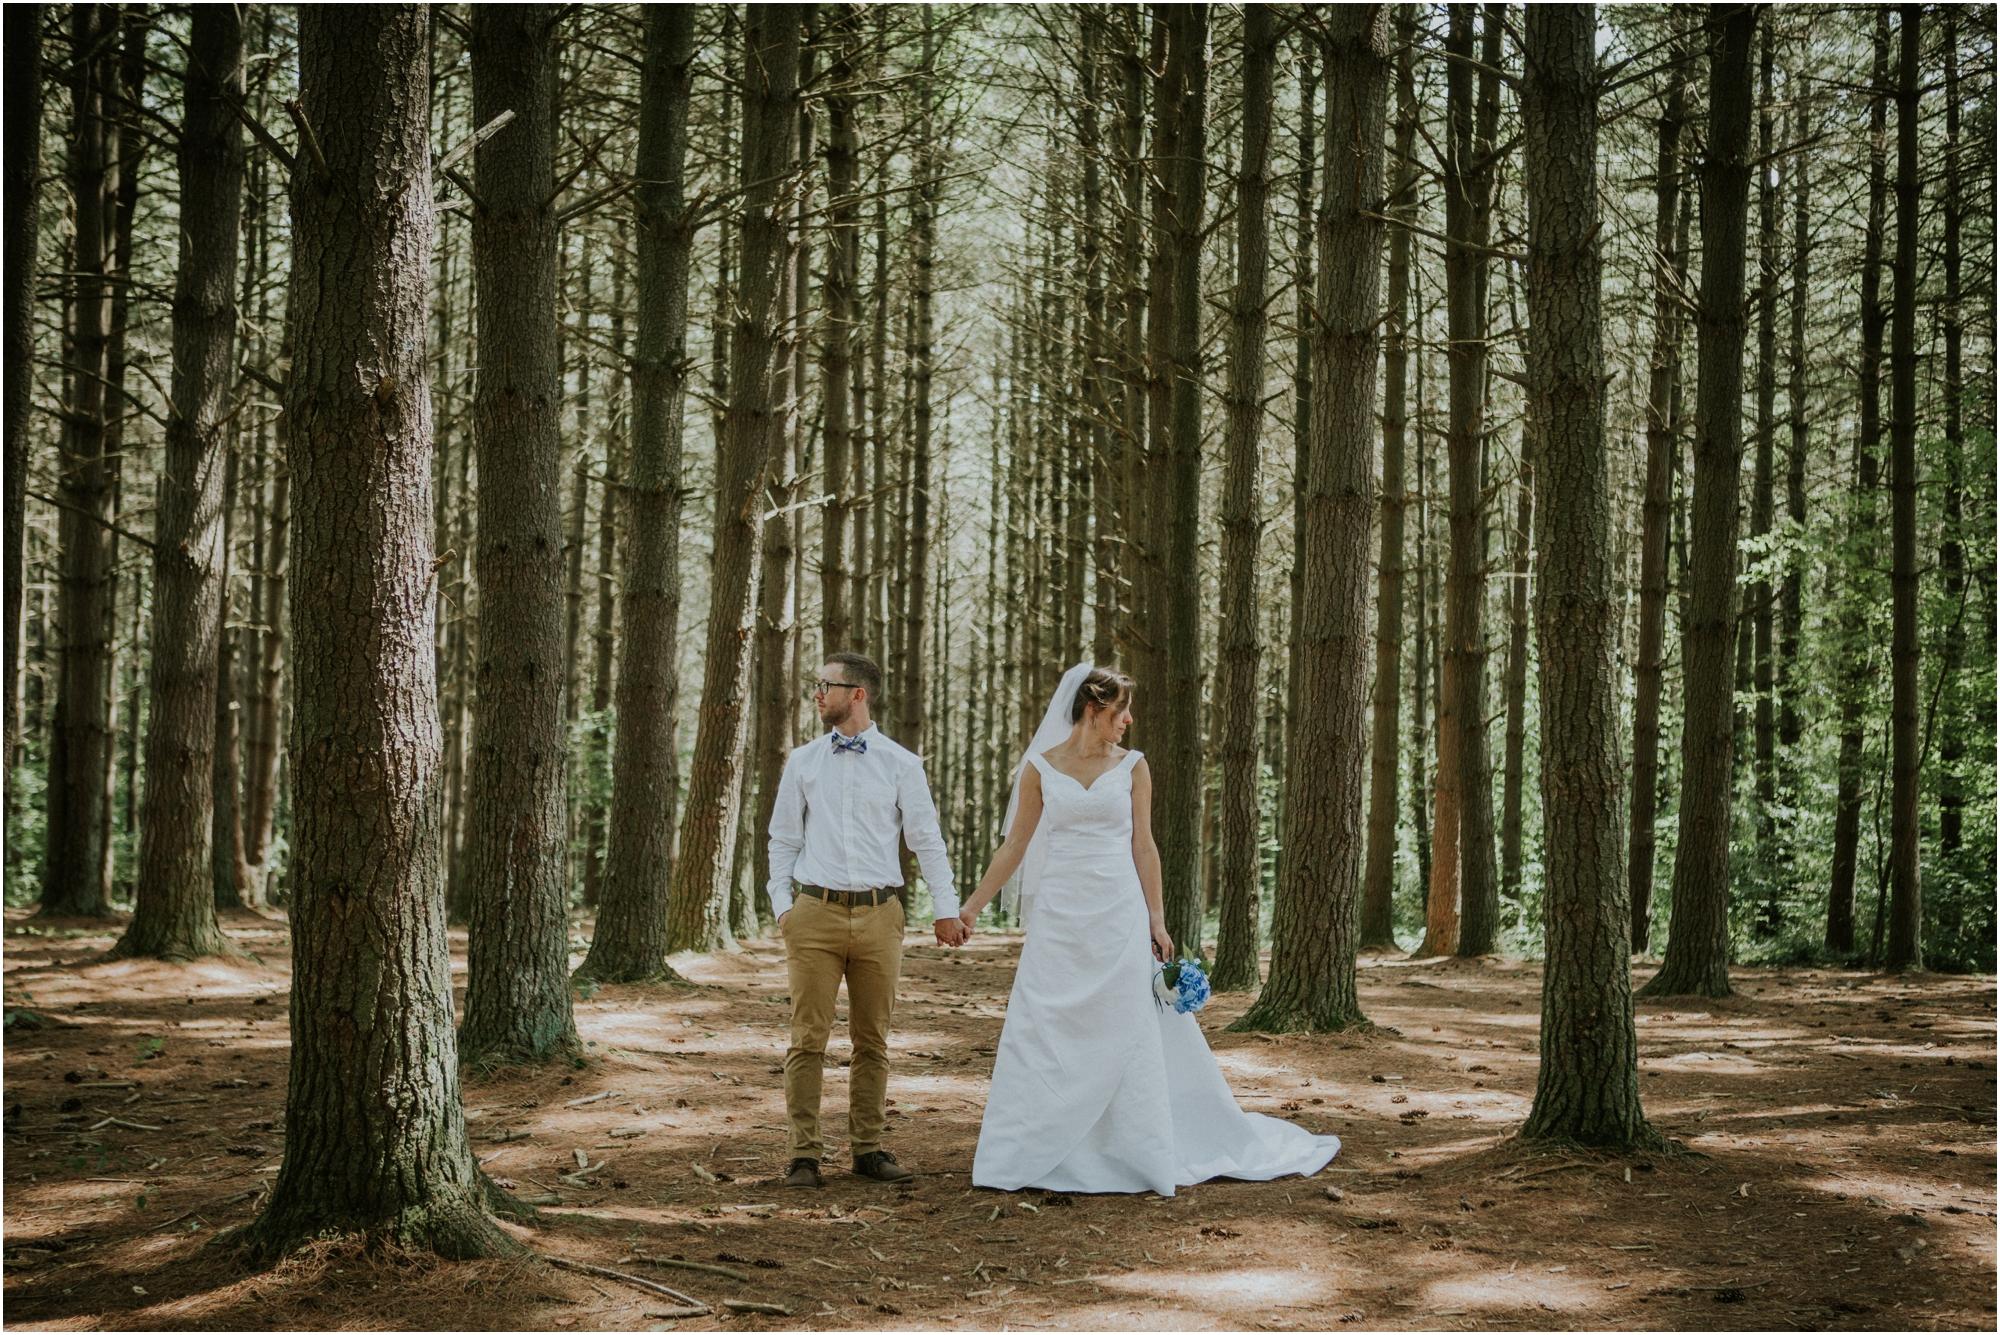 sugar-hollow-park-bristol-virginia-wedding-intimate-woodsy-black-forest-ceremony-adventurous-couple_0076.jpg